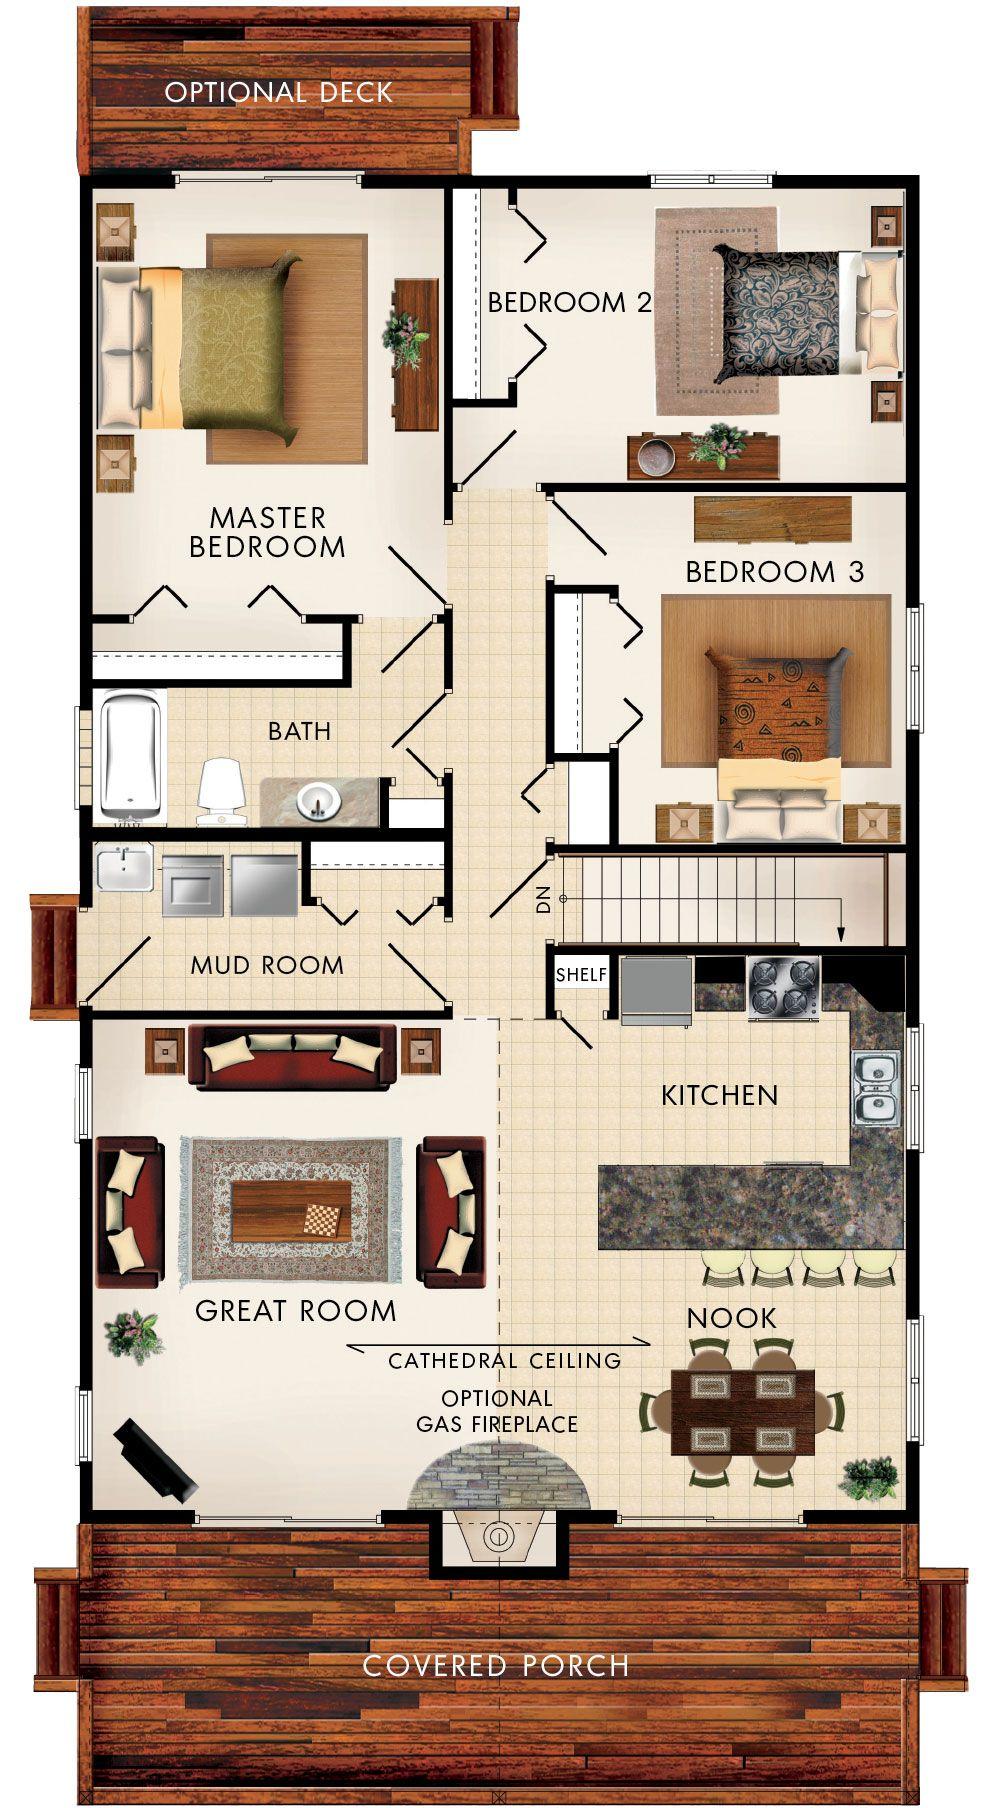 Baywood III Floor Plan  No stairs, Push back kitchen, bigger dinning